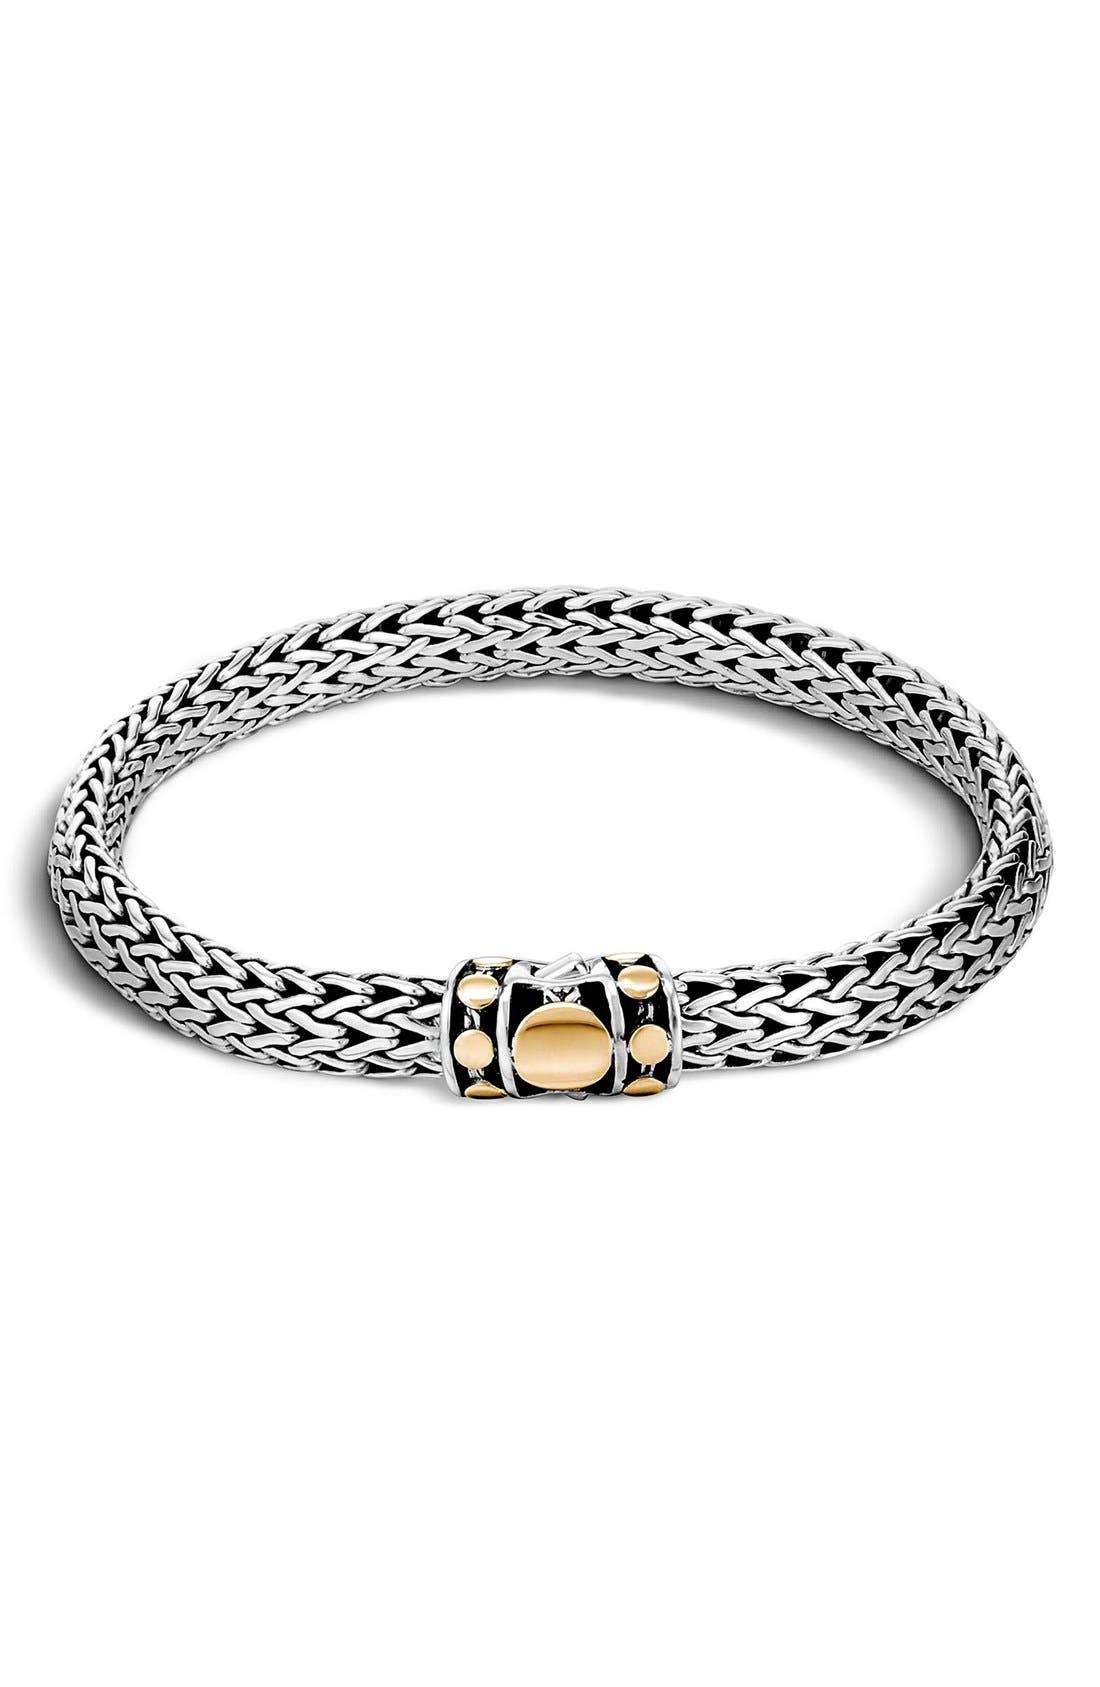 John Hardy 'Dot' Gold & Silver Chain Bracelet